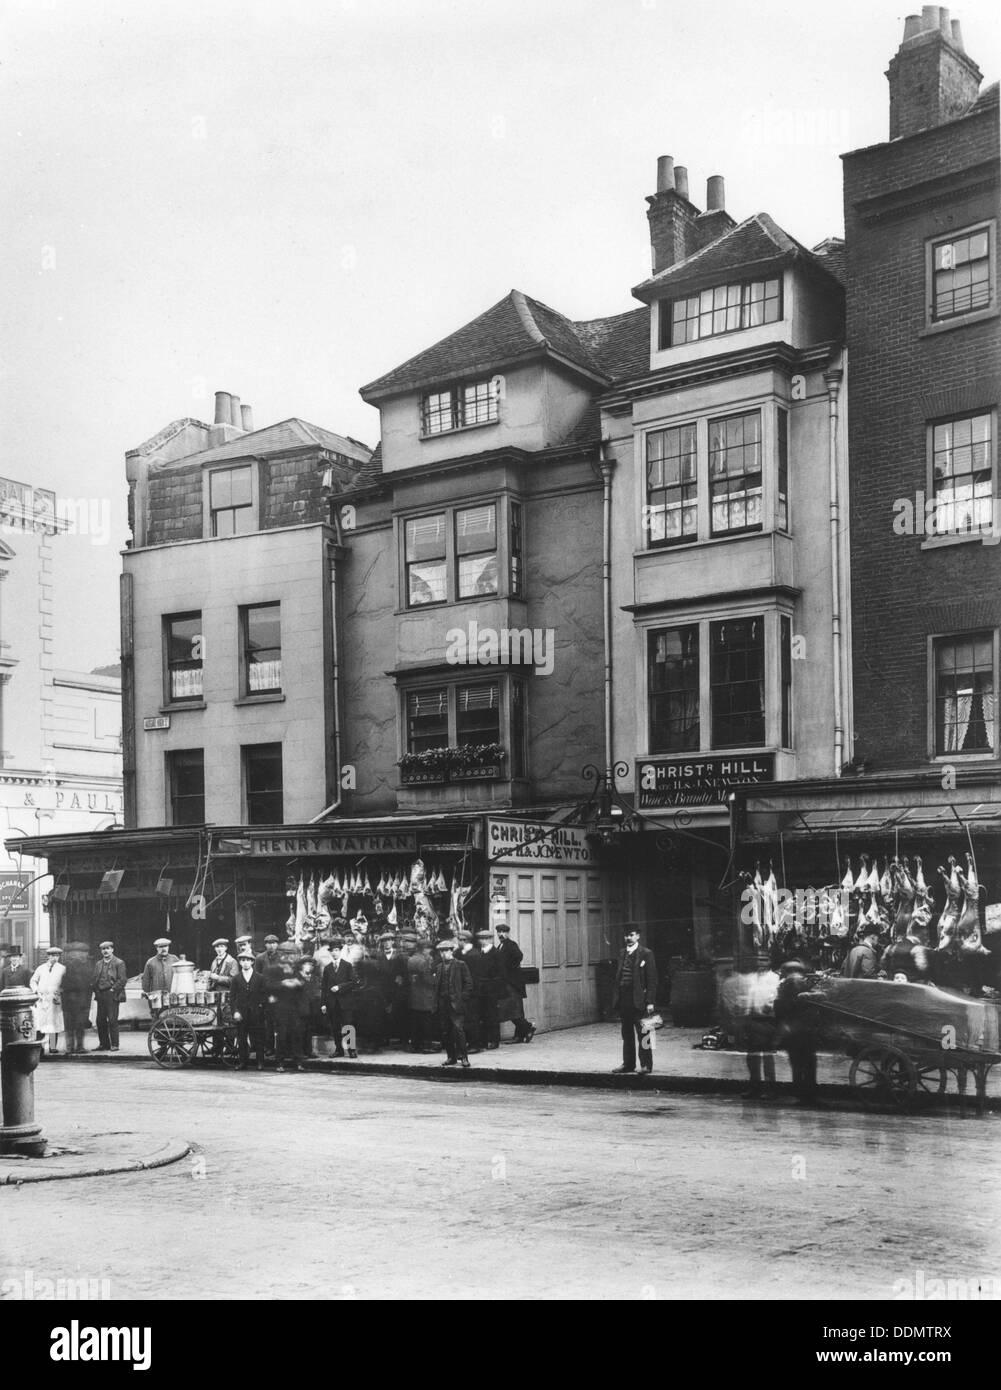 Jewish butcher's, Aldgate High Street, London, c1905. - Stock Image